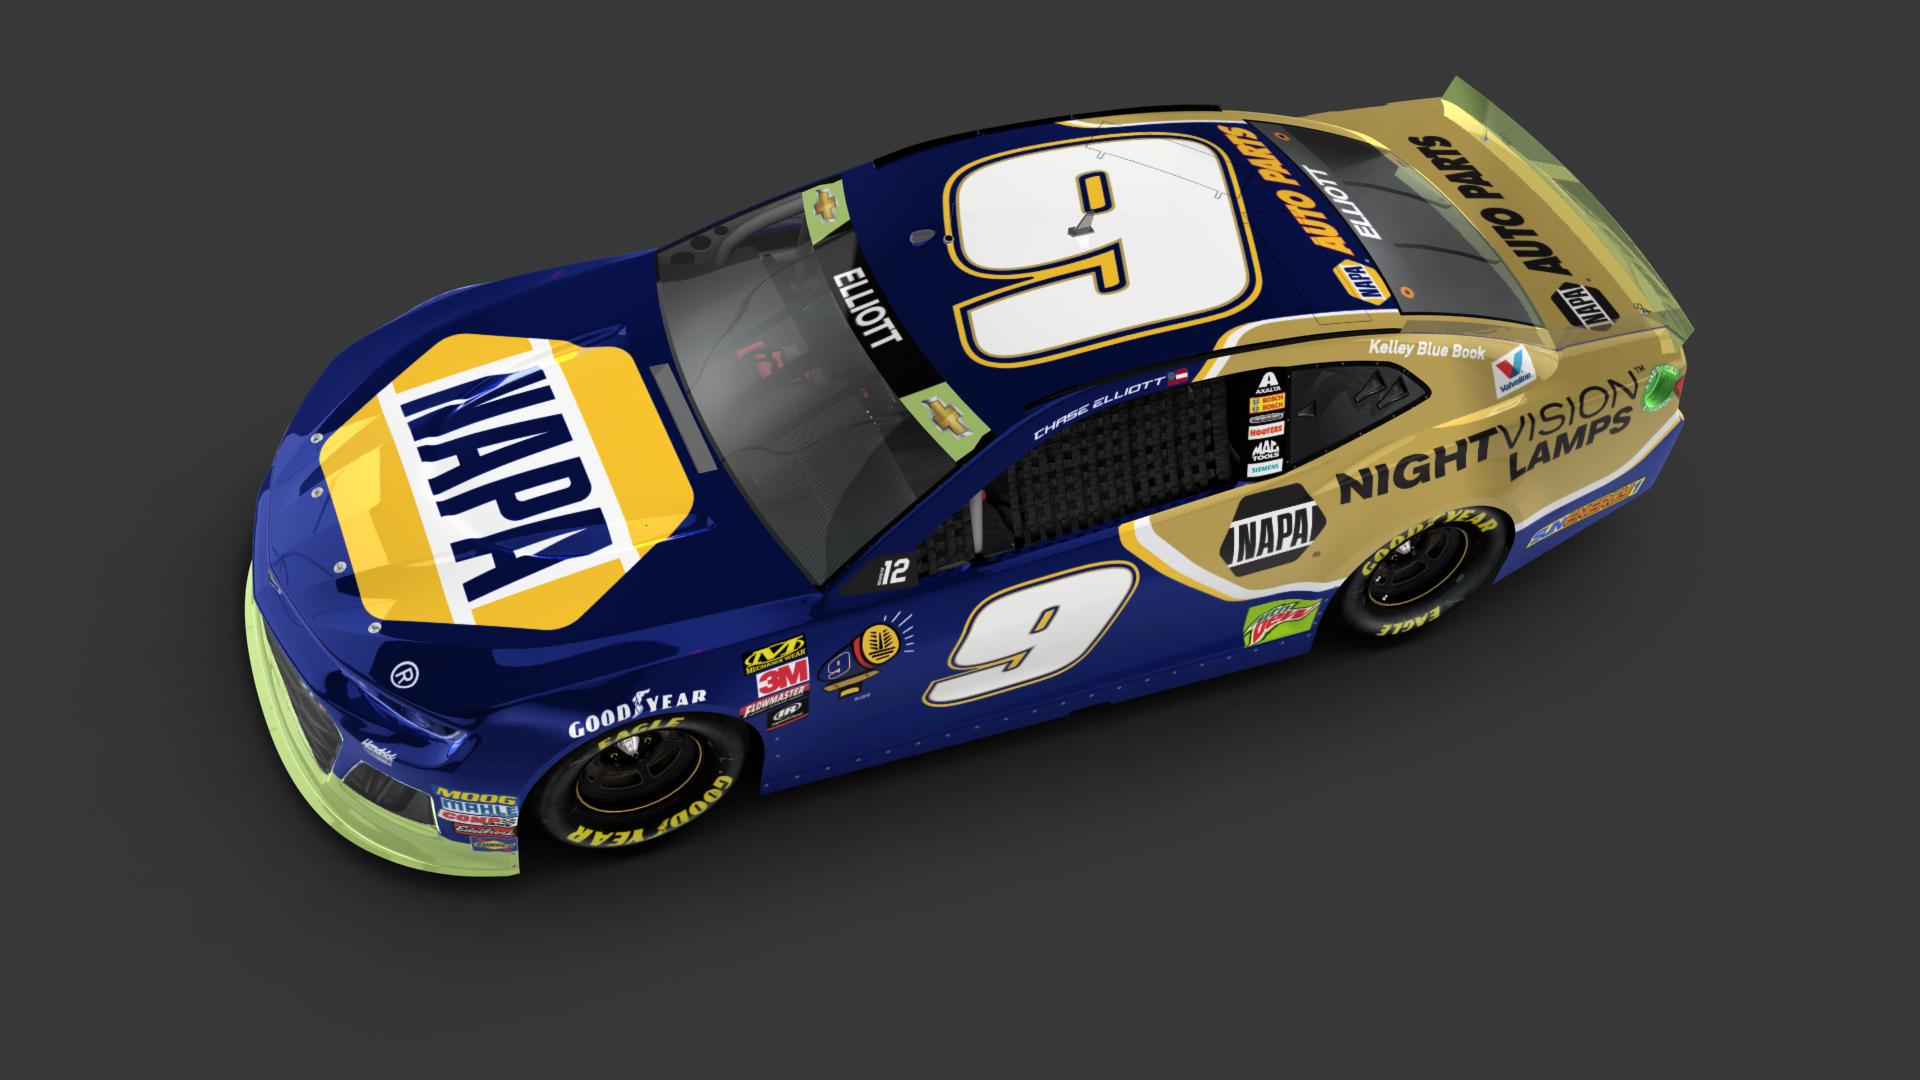 Rick Hendrick Chevy >> Elliott to drive new NAPA Nightvision Chevy at Talladega   Hendrick Motorsports